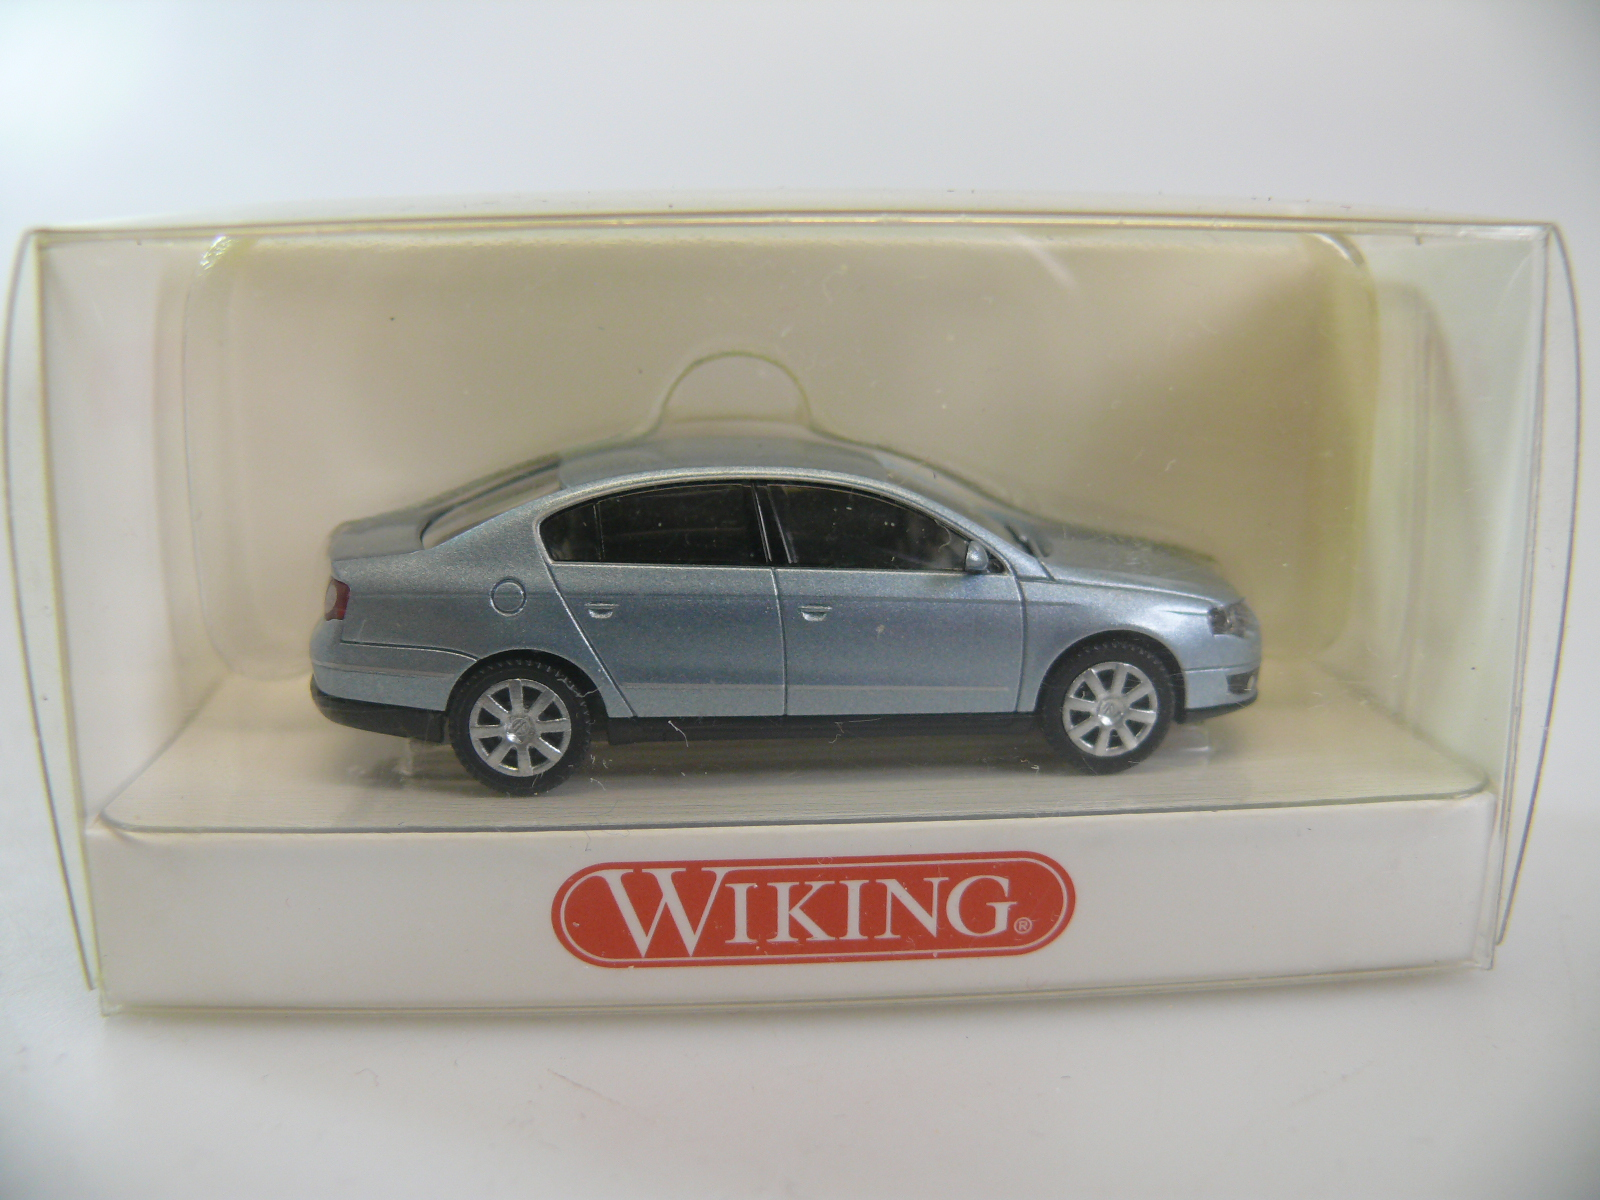 Wiking 064 01 29 VW Passat Limousine in eisblau-metallic mit OVP #14